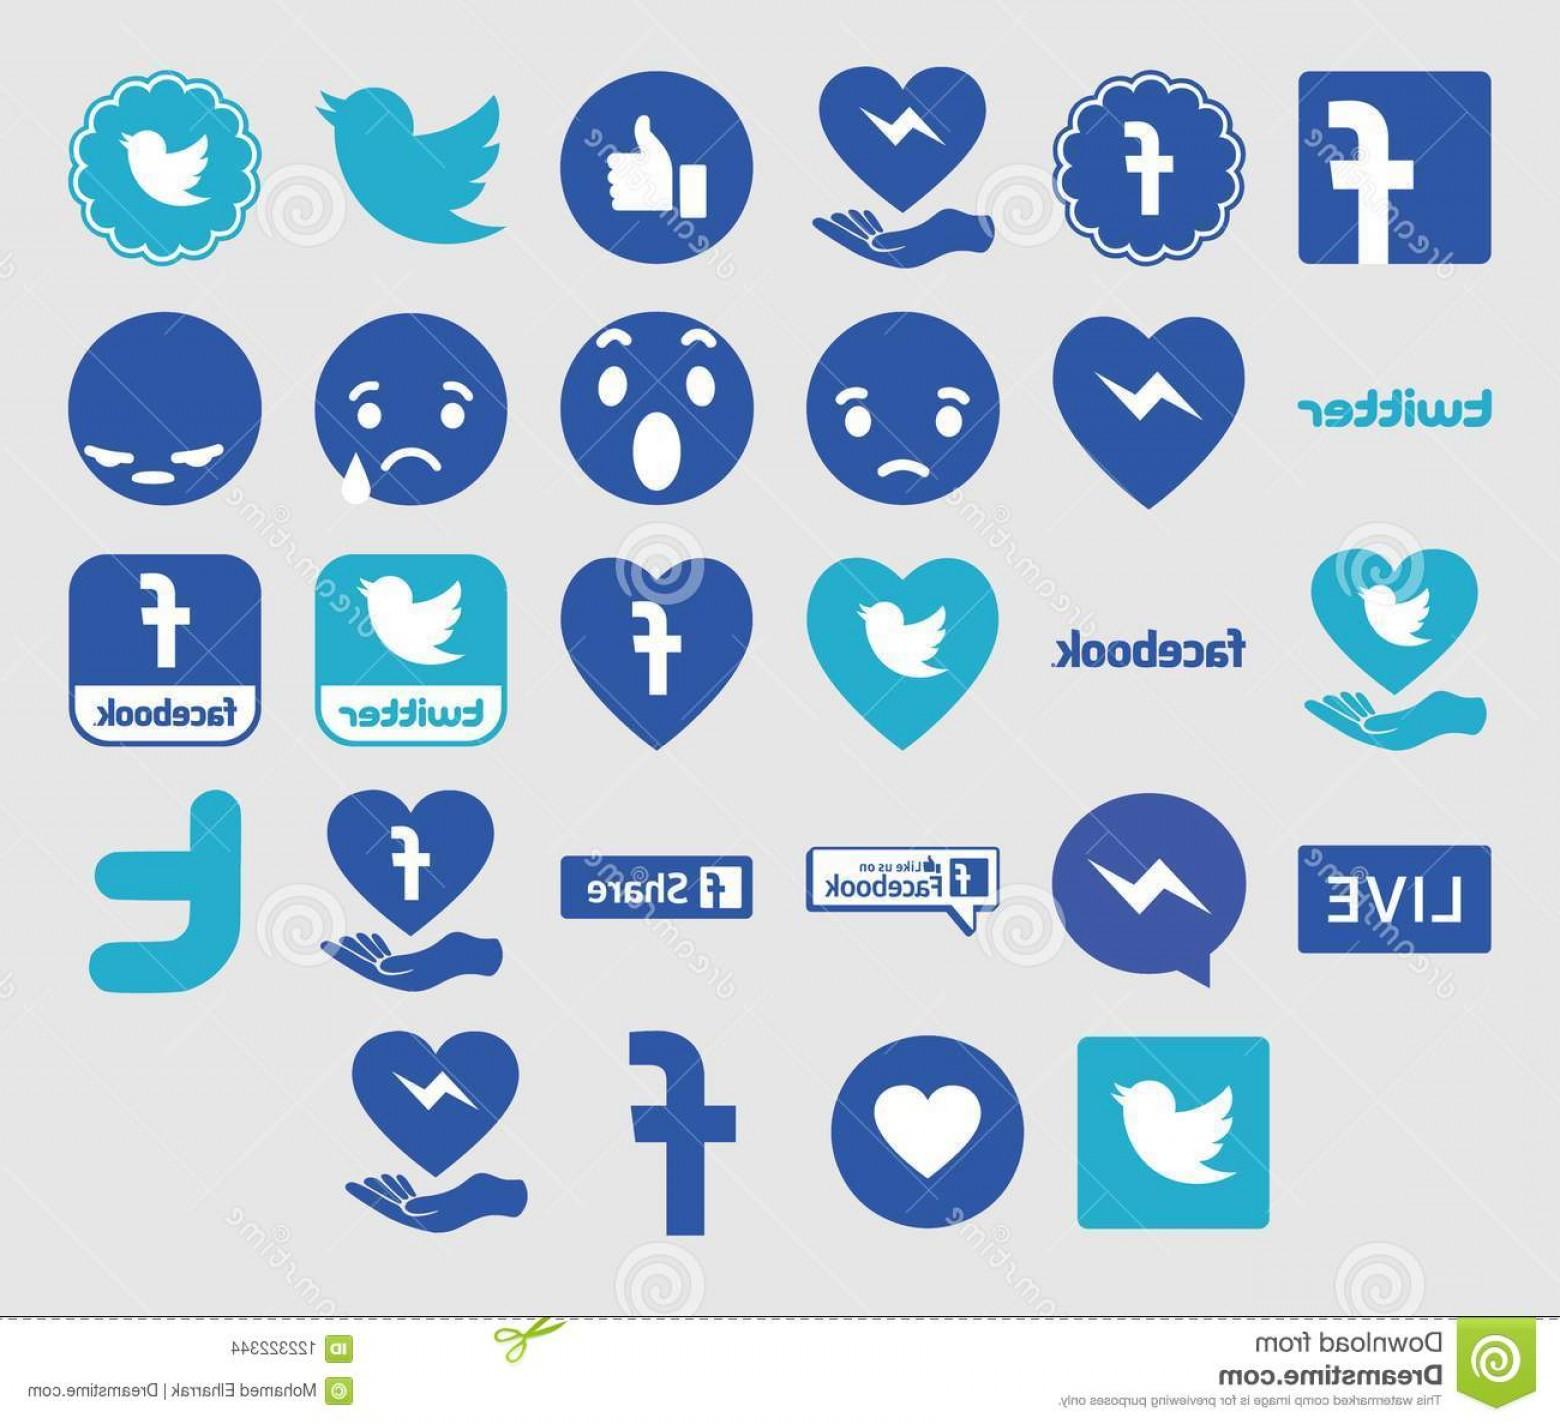 Download Logos Facebook Twitter Messenger Like Share Vectors.